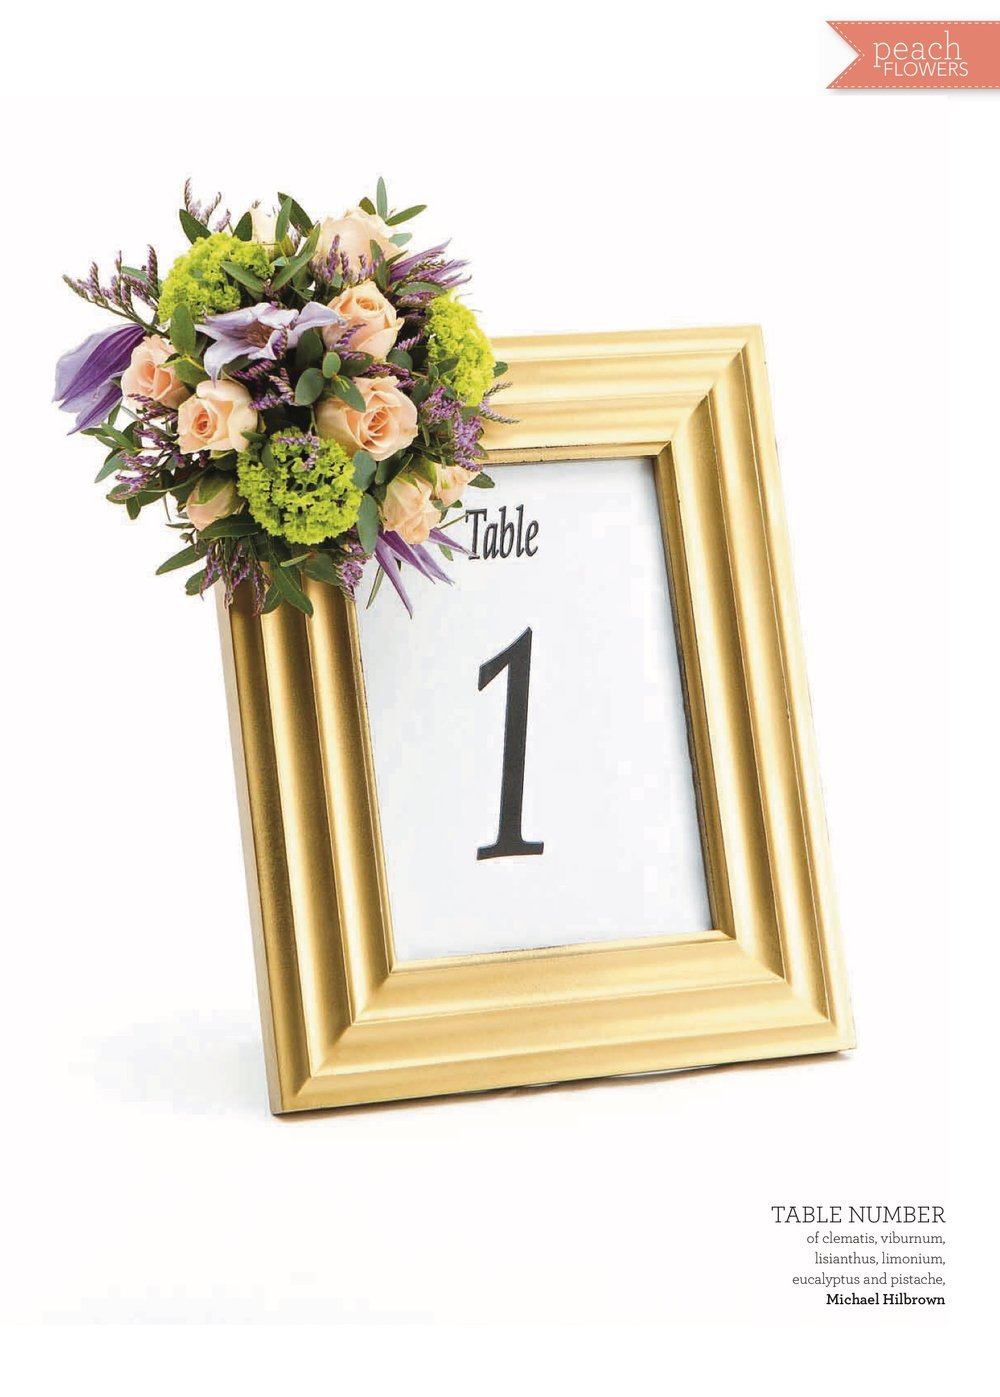 Michael Hilbrown Florist - Table Number Floral Design - Wedding Flowers Magazine July & August 2016.jpg